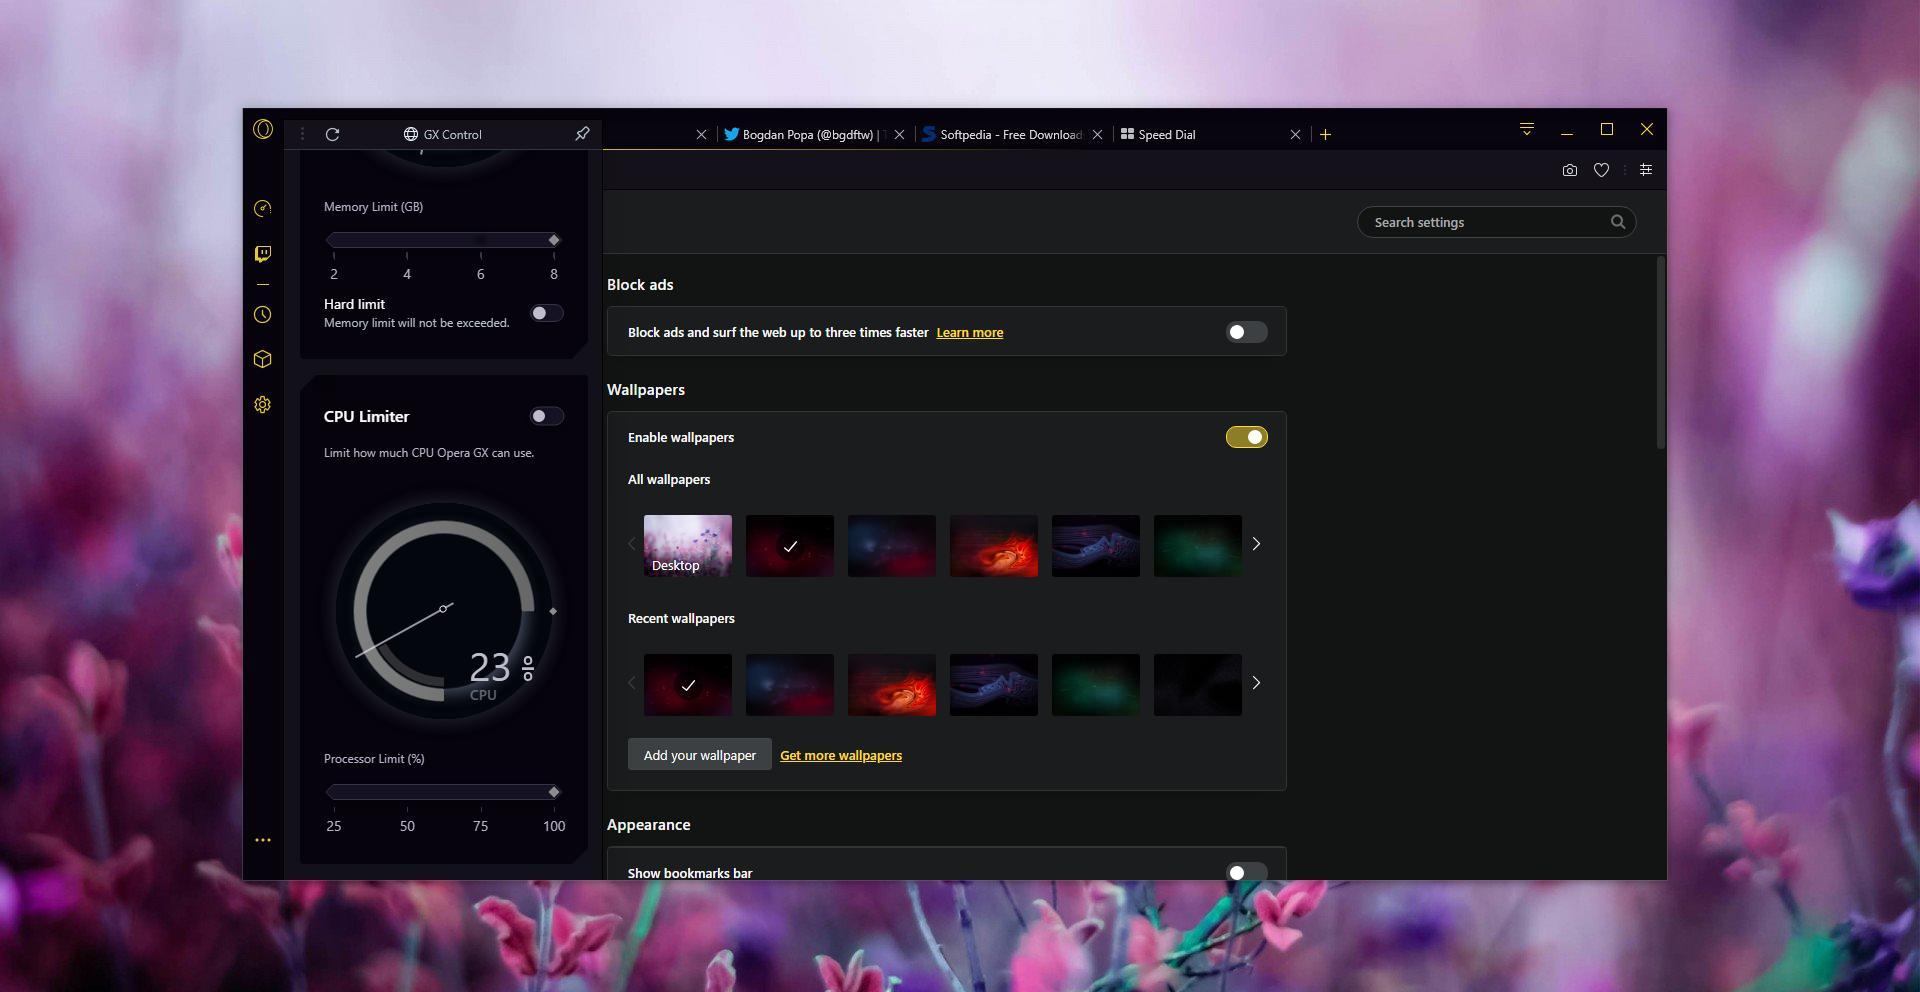 Opera GX: Tο πρώτο πρόγραμμα περιήγησης για gamers στον κόσμο Gettin12